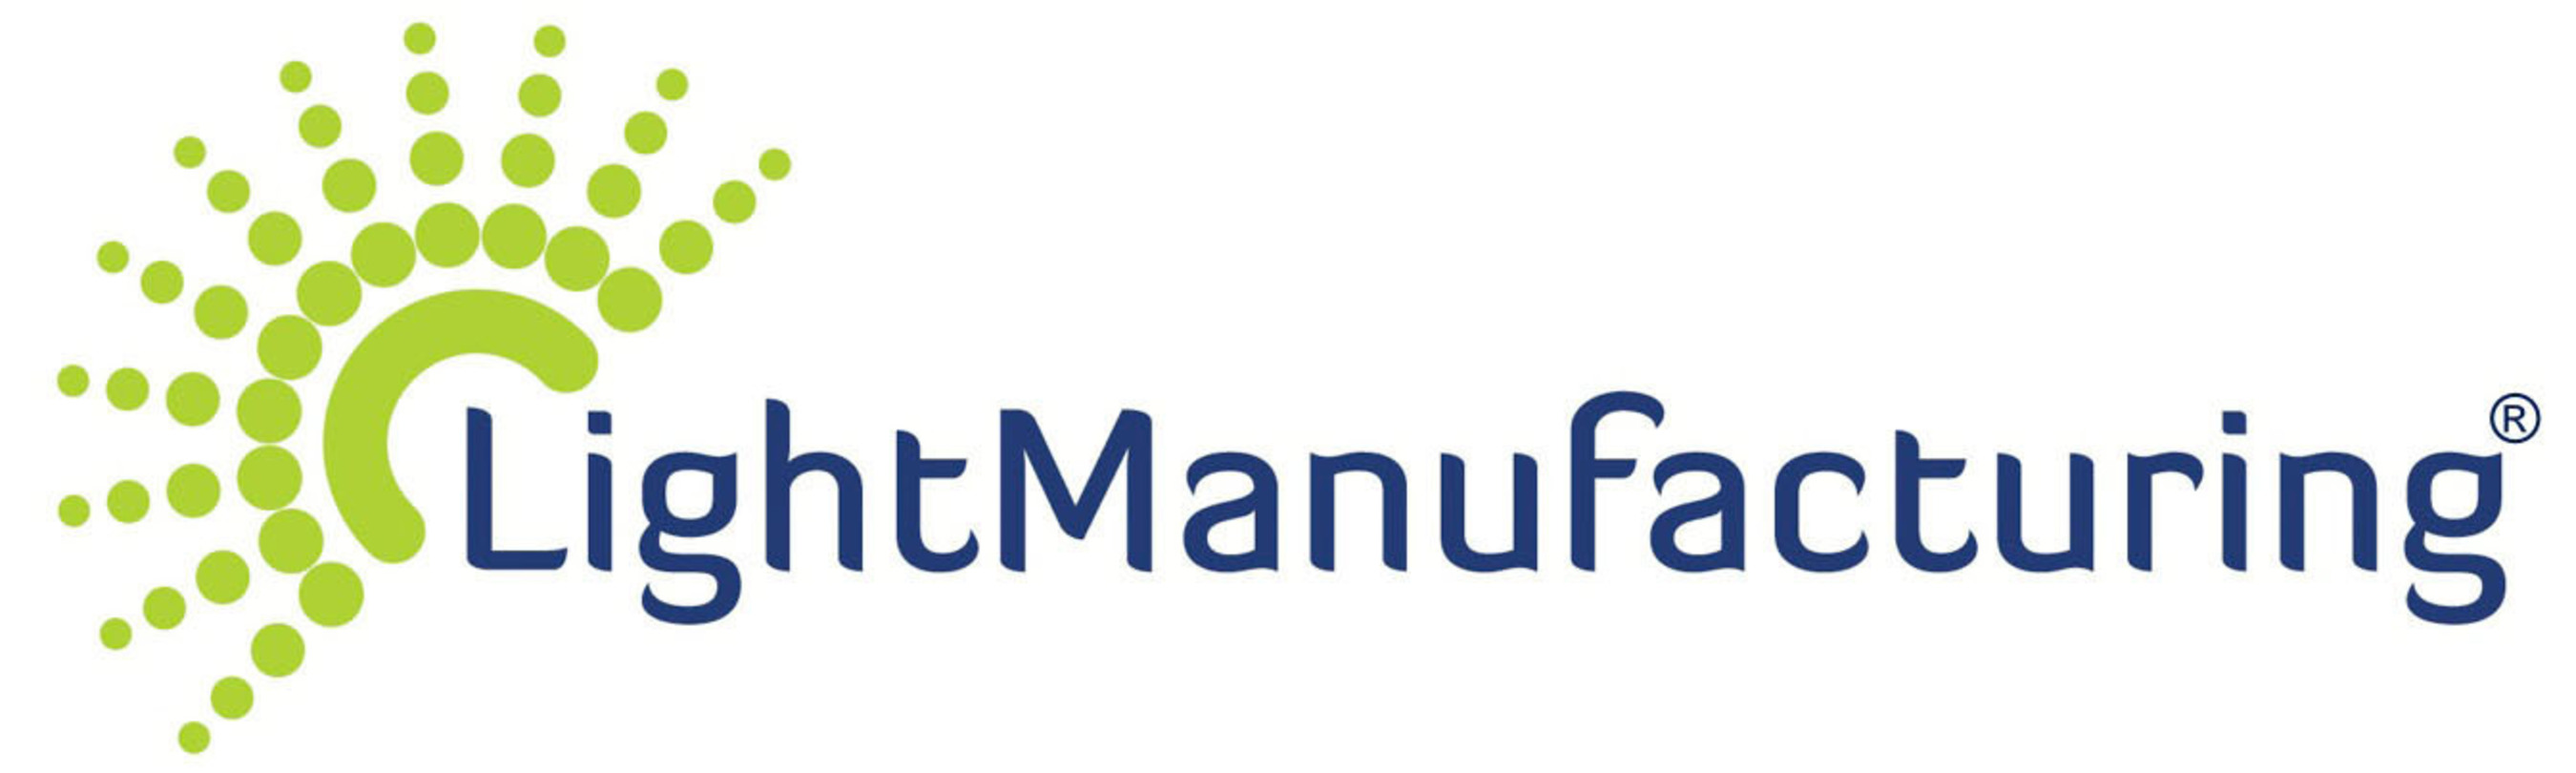 LightManufacturing LLC Logo. (PRNewsFoto/LightManufacturing LLC) (PRNewsFoto/LIGHTMANUFACTURING LLC)